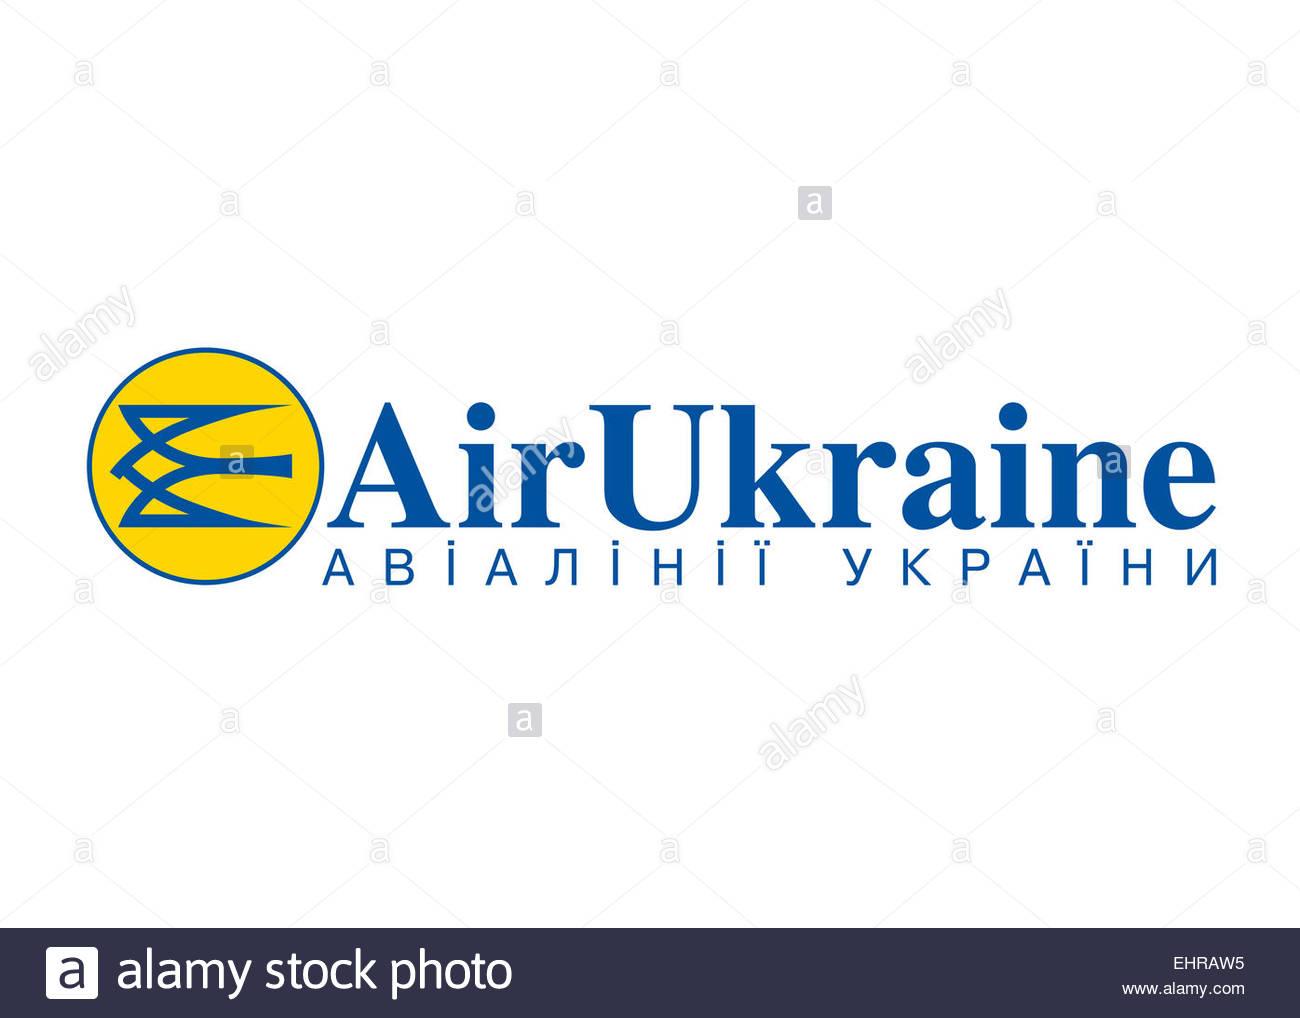 Air Ukraine logo symbol icon flag emblem - Stock Image